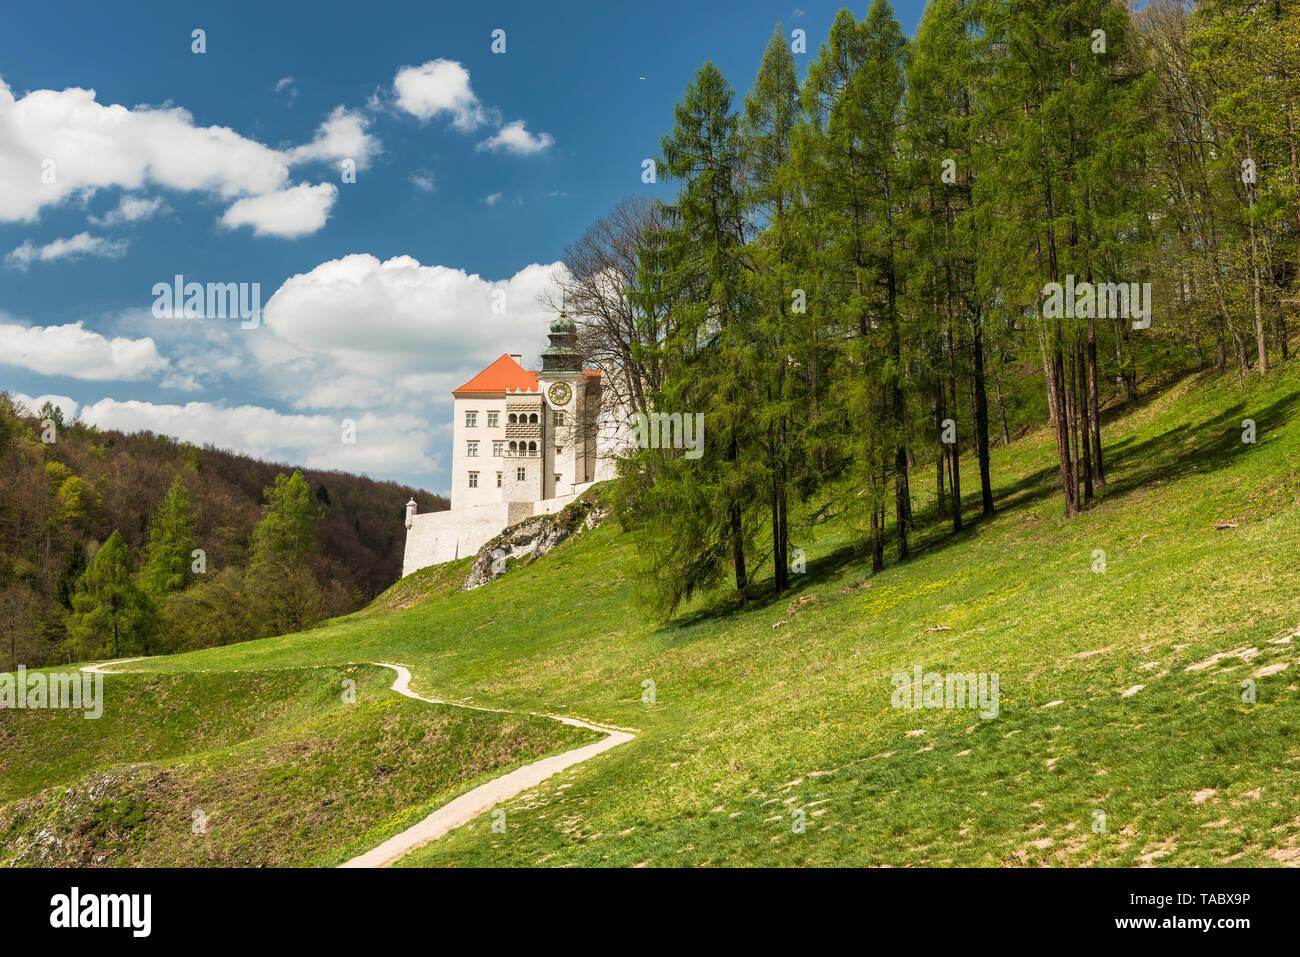 Historic castle Pieskowa Skala in Ojcow National Park near Krakow in Poland Stock Photo